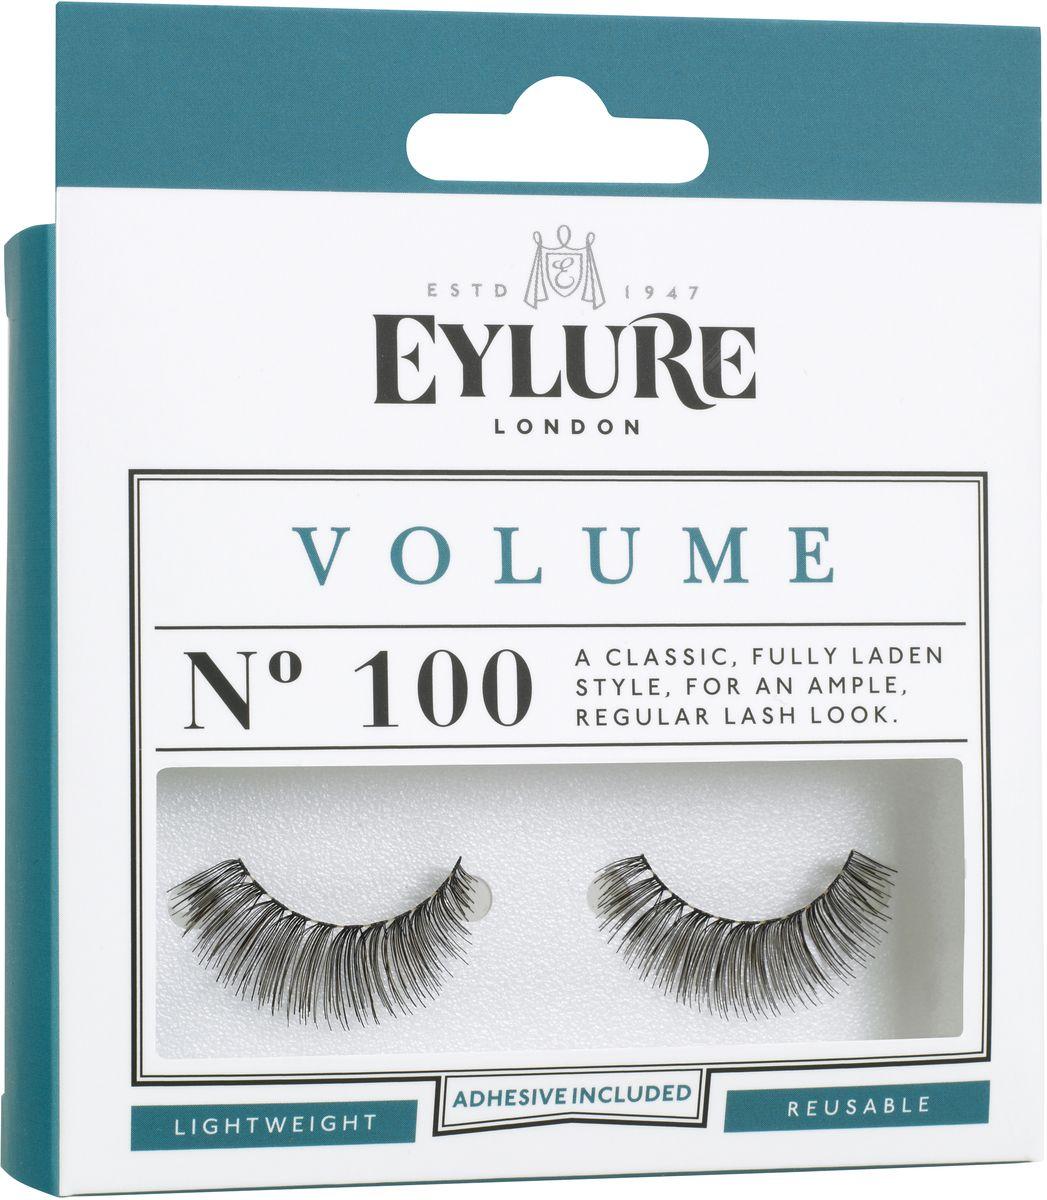 Eylure Накладные реницы объемные Volume. 6001110